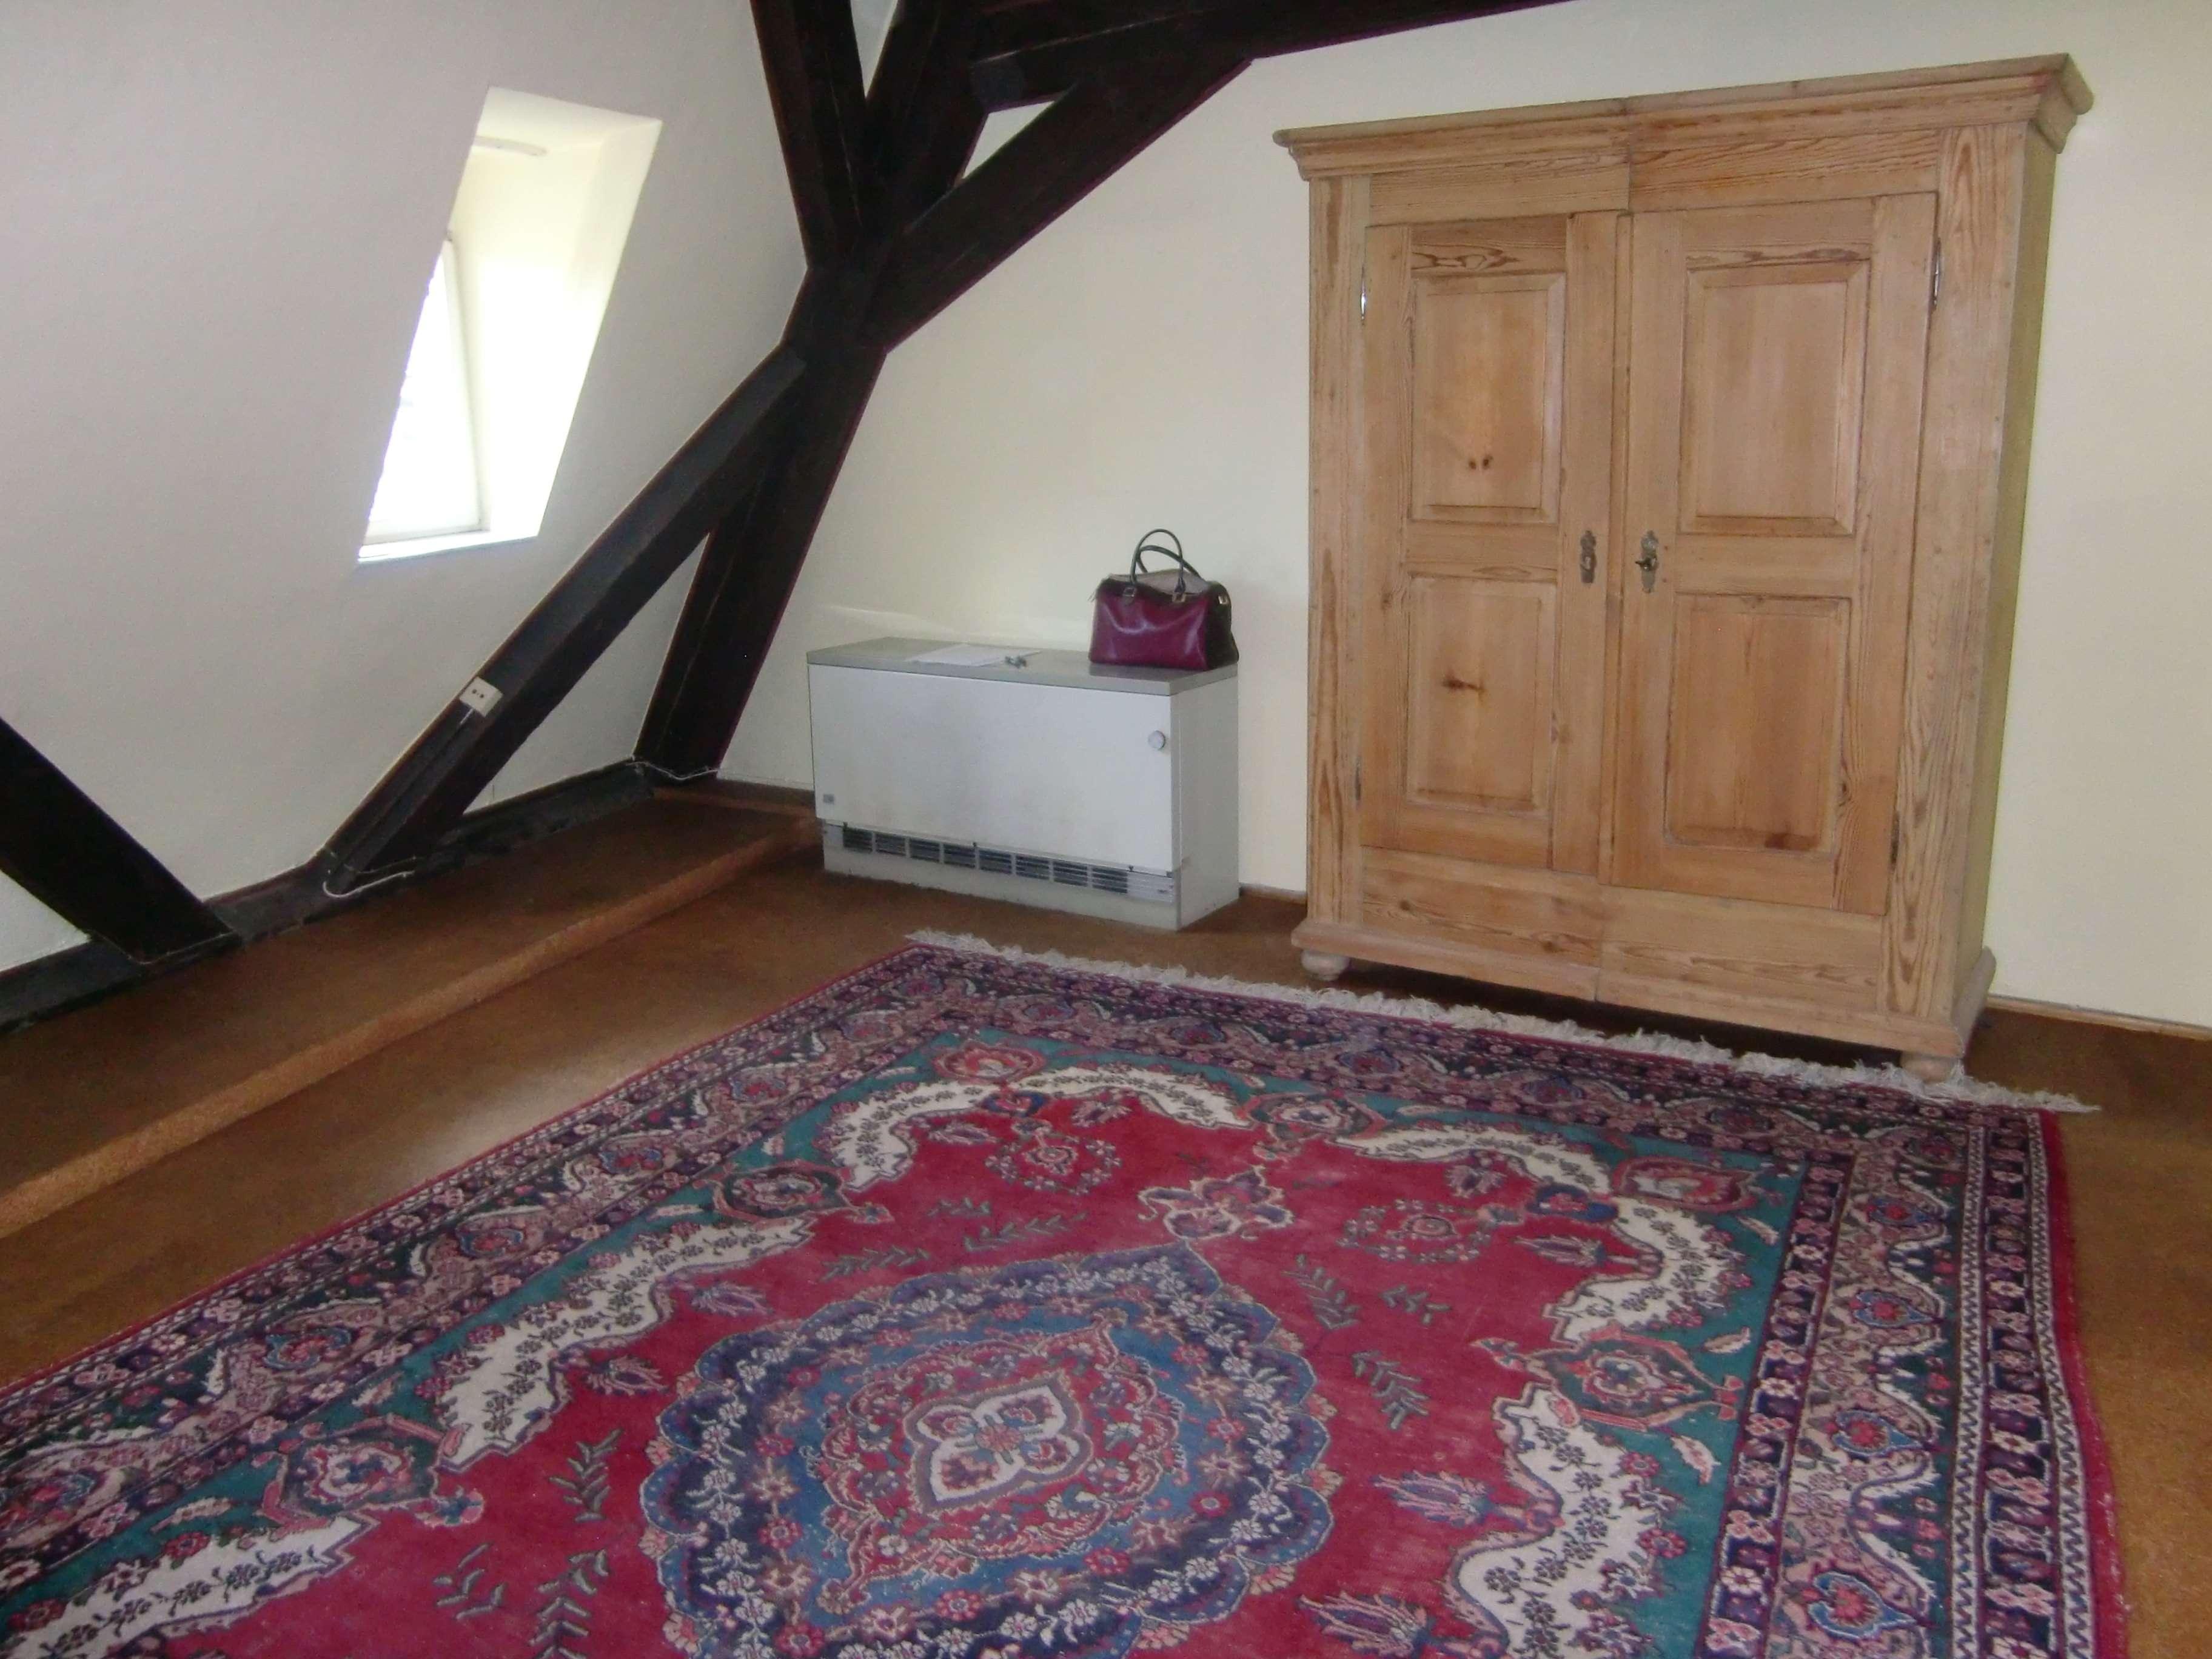 Bamberg-Zentrum: schöne 1-Zi.-DG-Wohnung in historischen Ambiente in Berg (Bamberg)